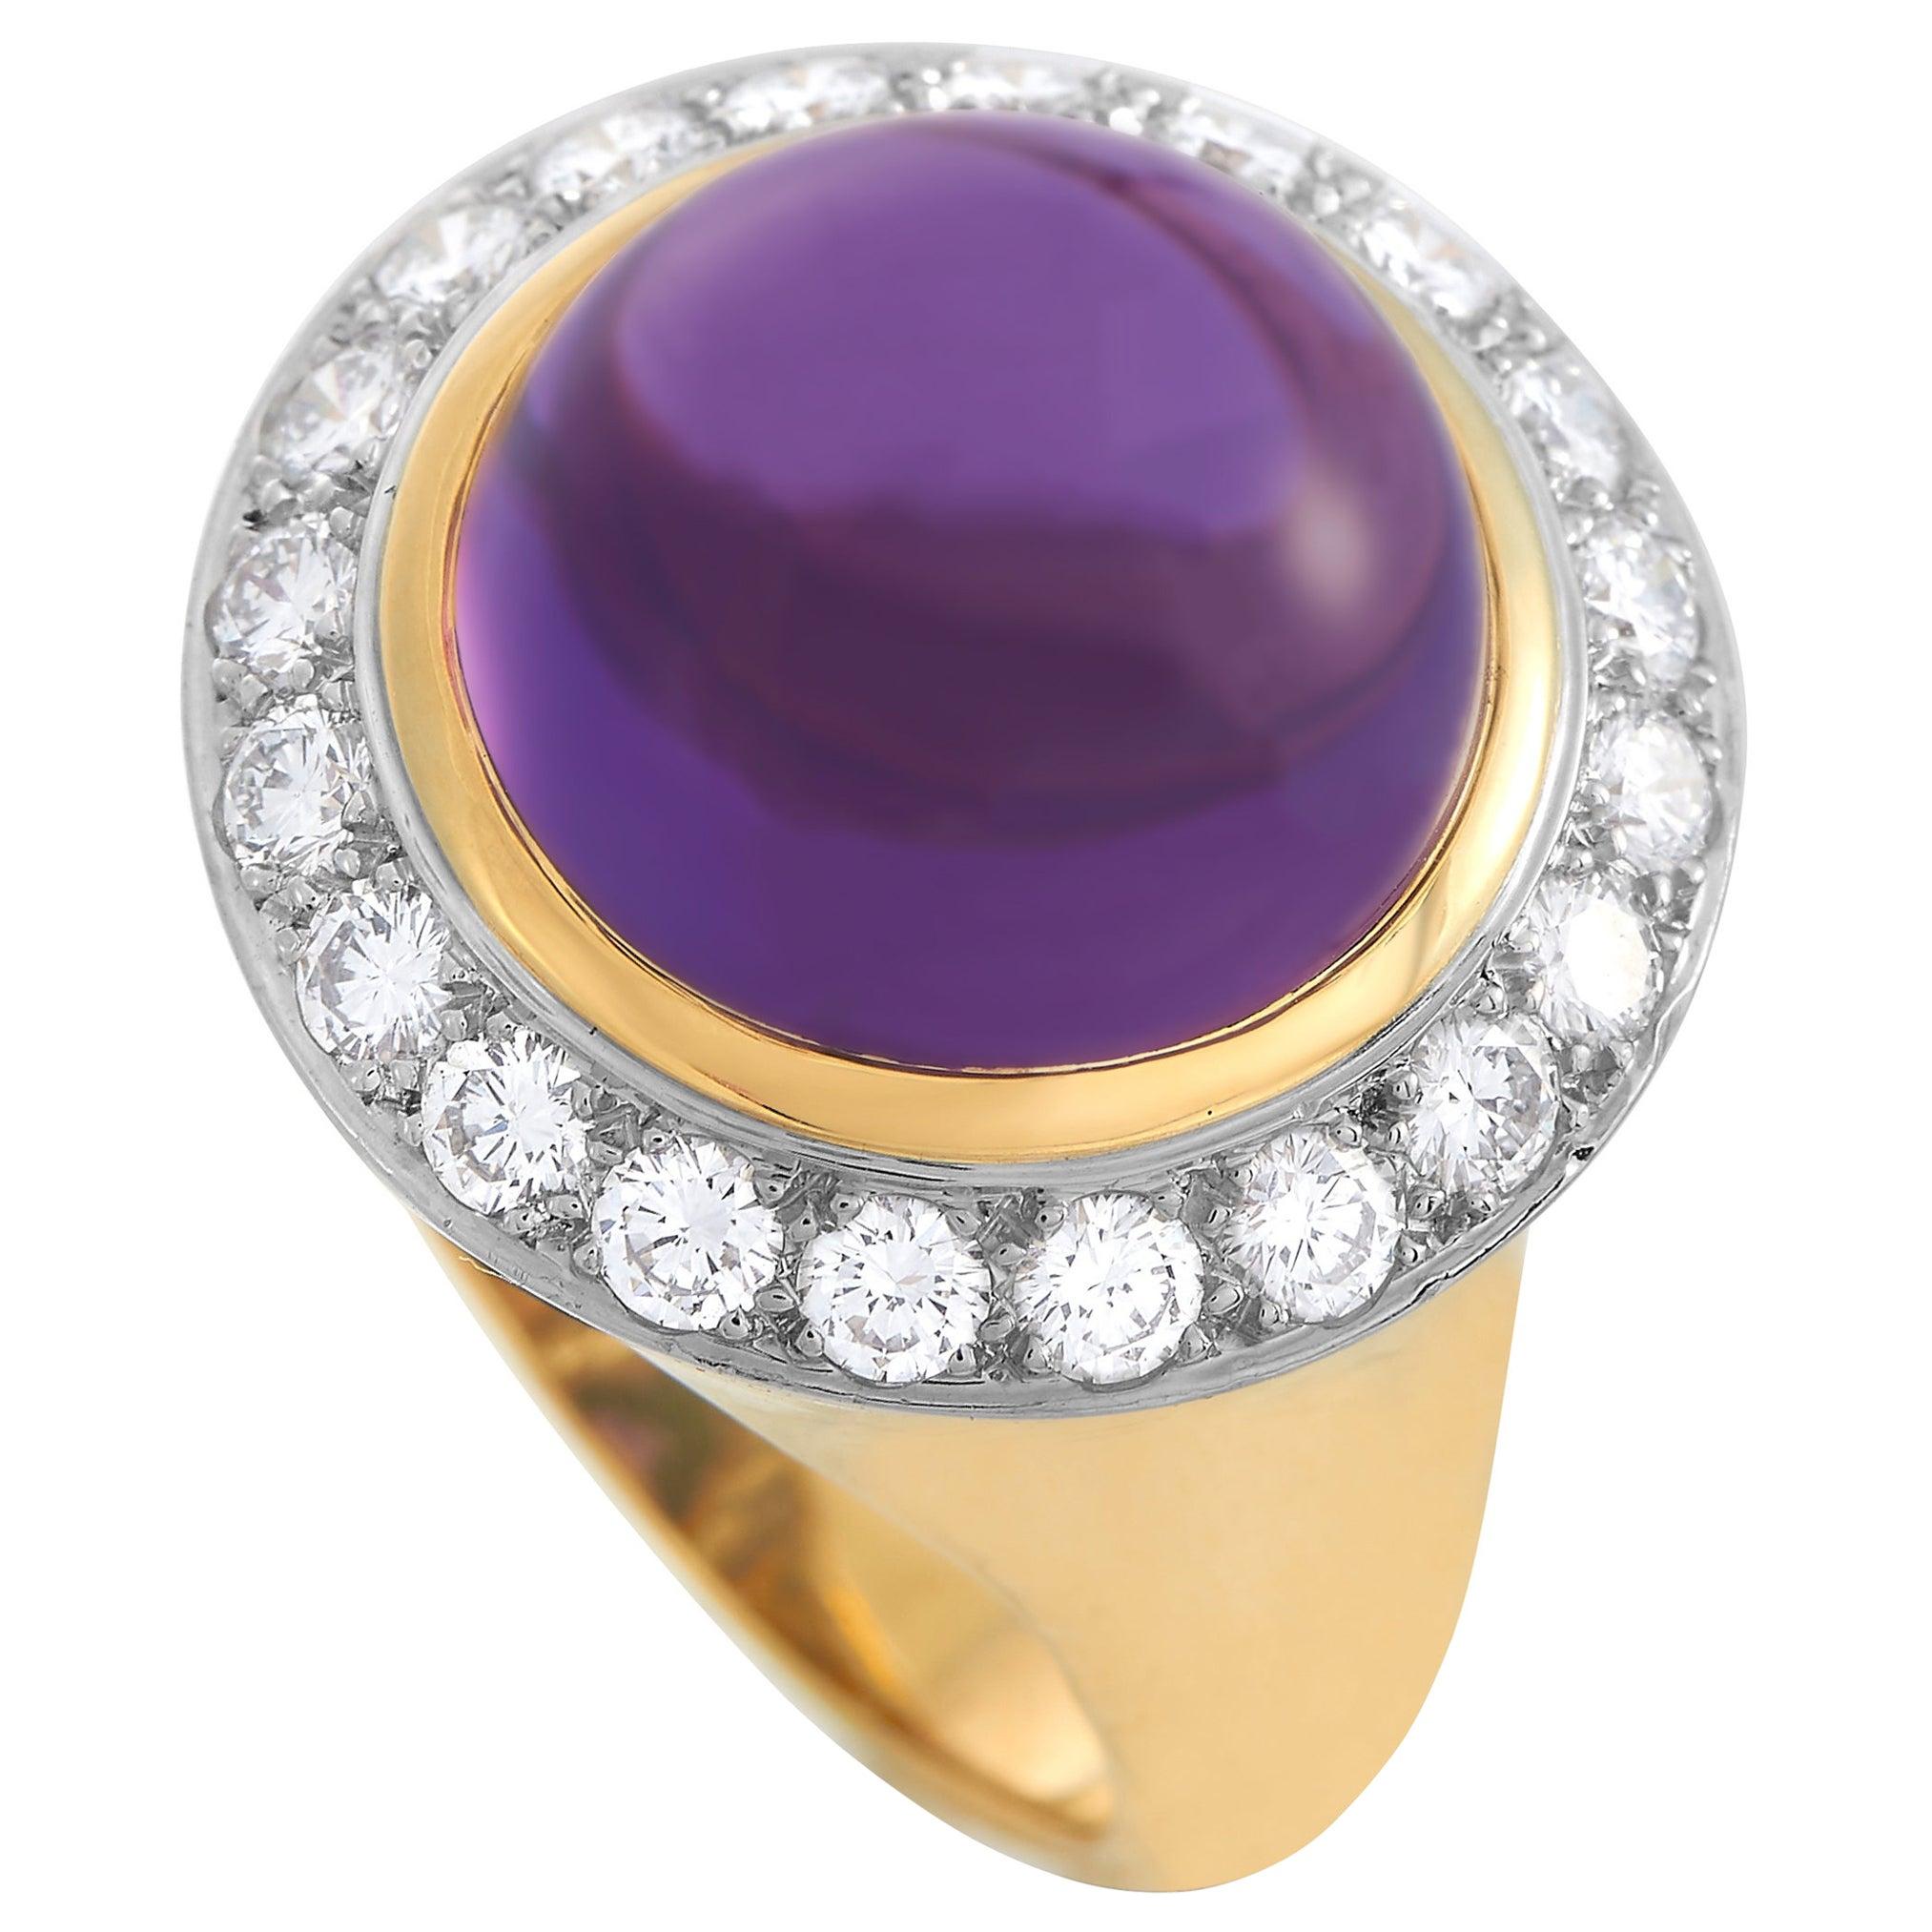 Tiffany & Co. 18K Yellow Gold 1.50 Ct Diamond and Amethyst Ring